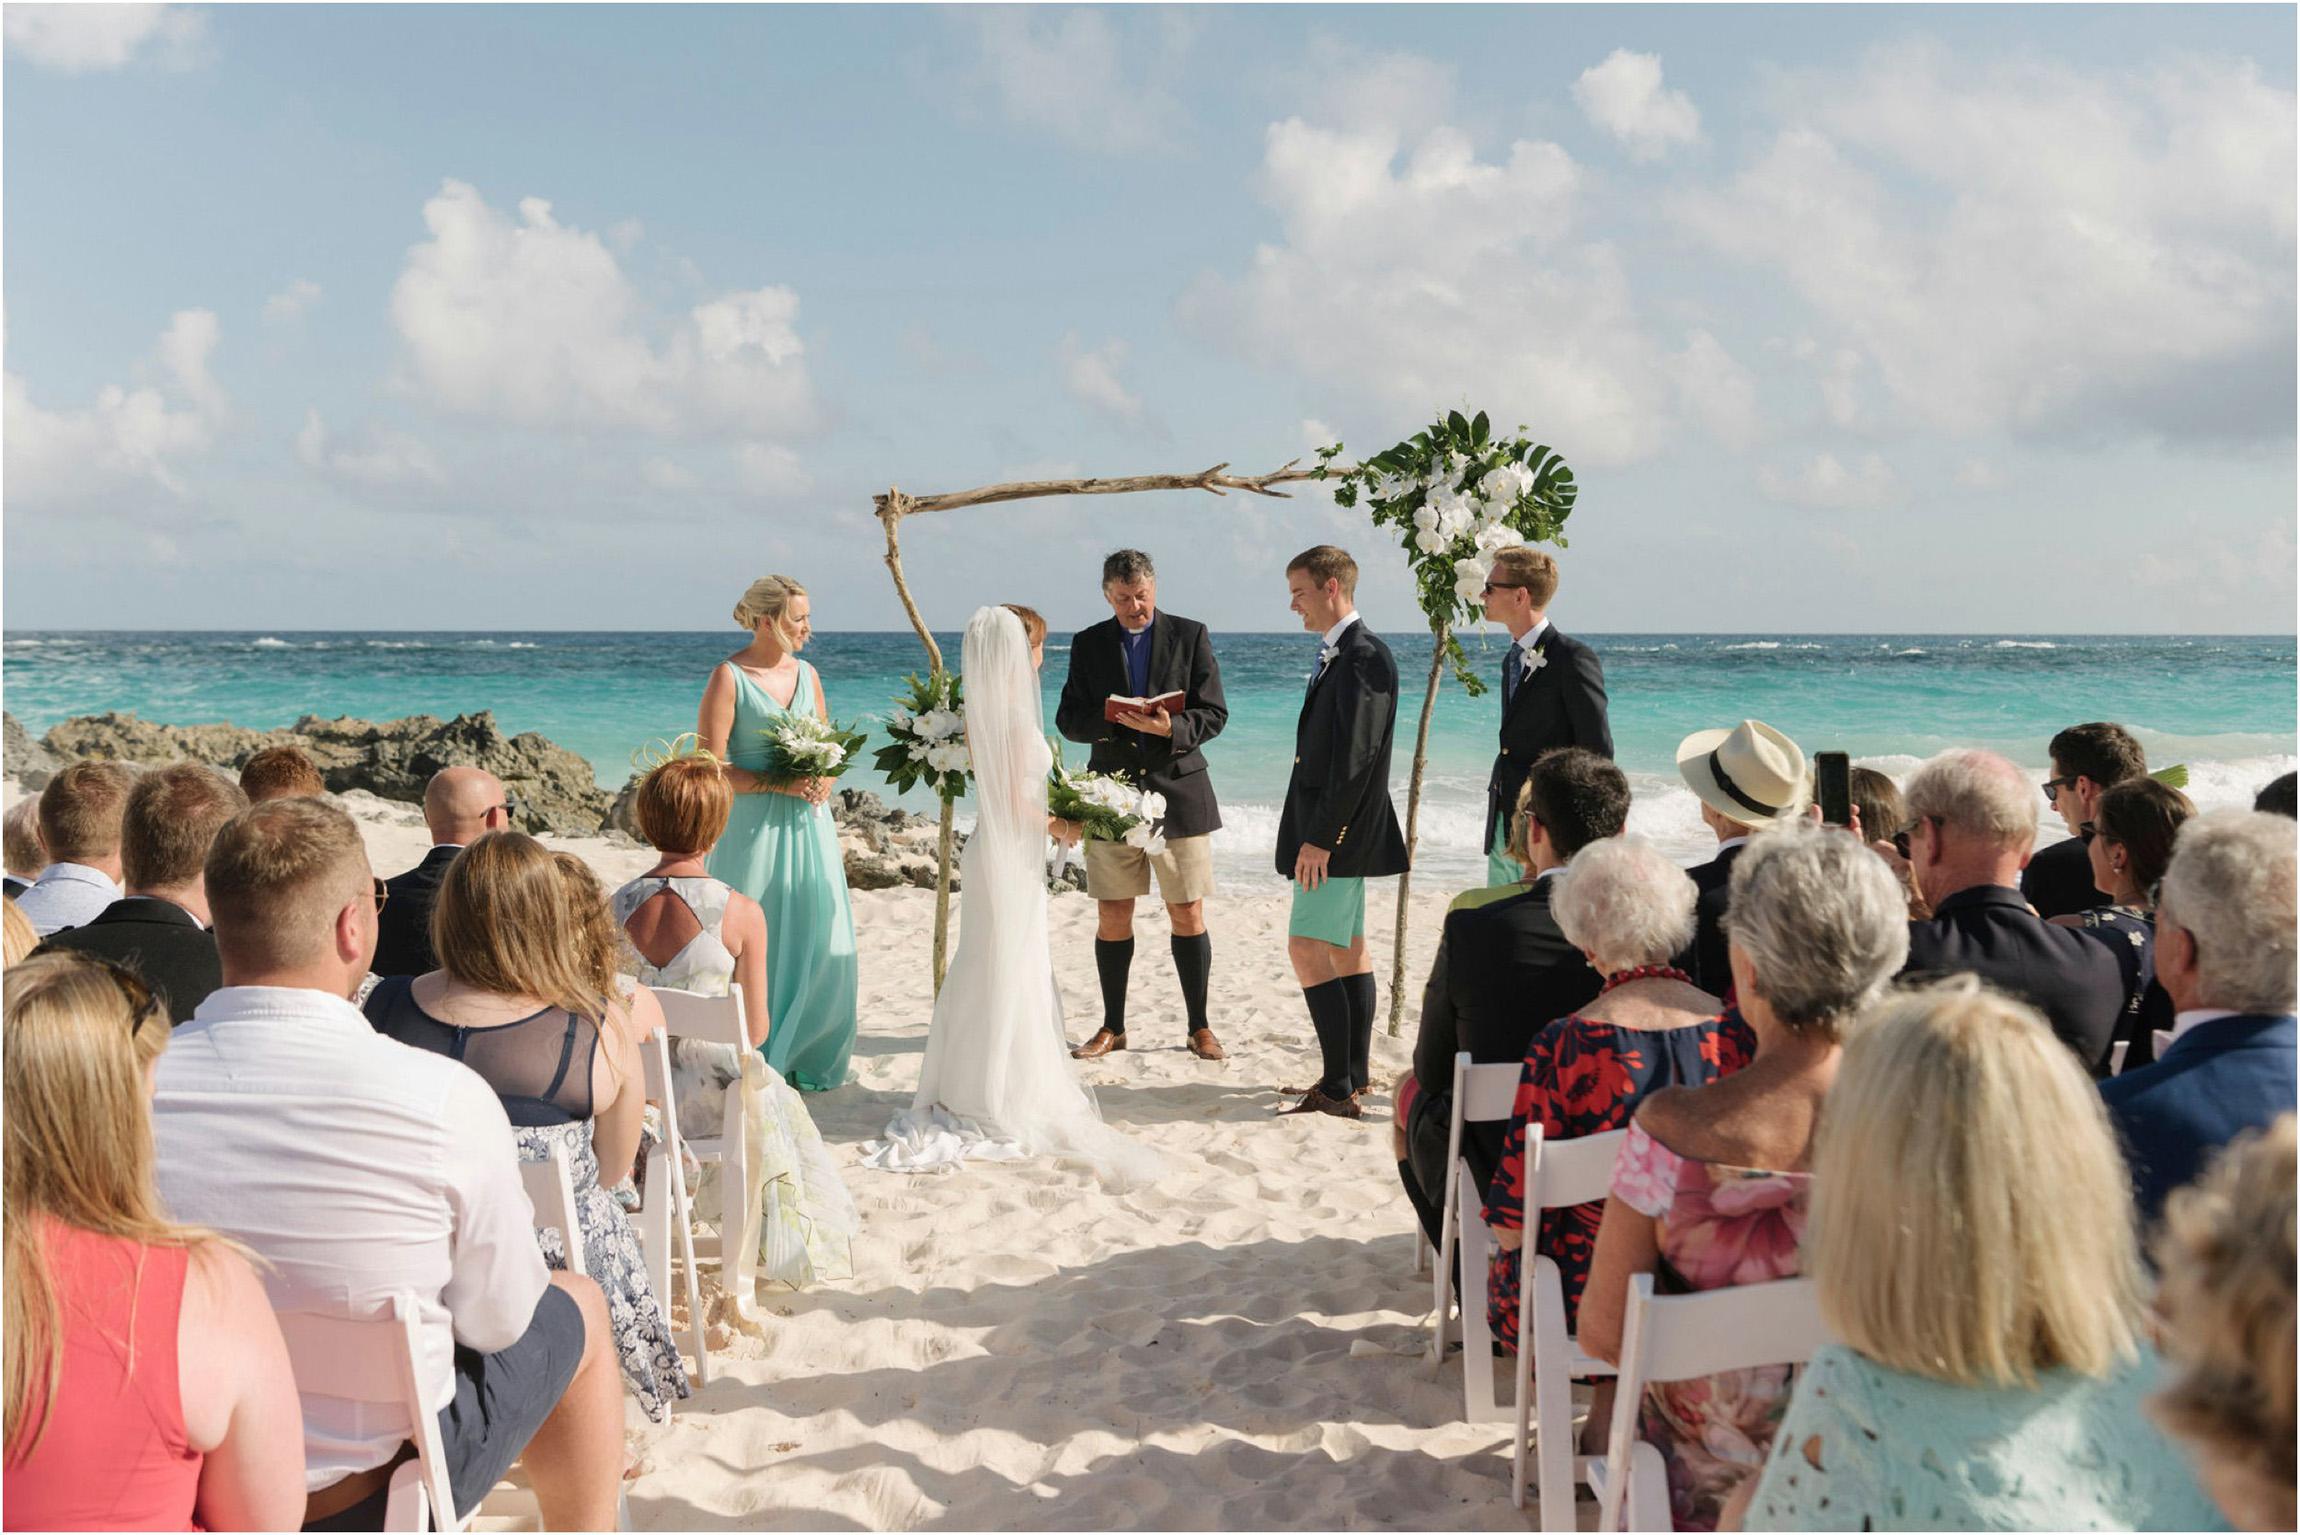 ©FianderFoto_Bermuda Wedding Photographer_Mid Ocean_Rachel_Angus_026.jpg